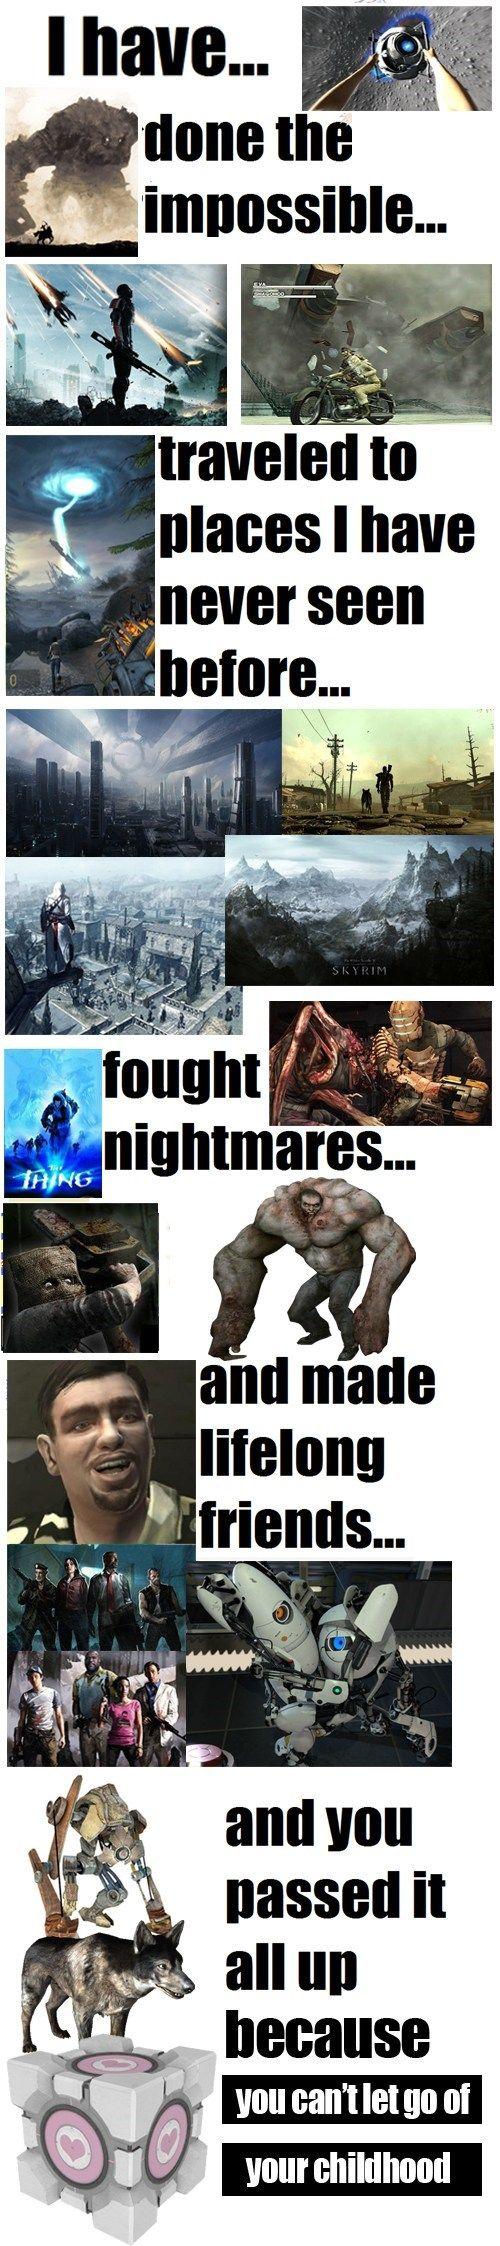 Video Games Video Game Memes Video Game Memes Cheezburger Gaming Memes Video Game Memes Video Game Quotes